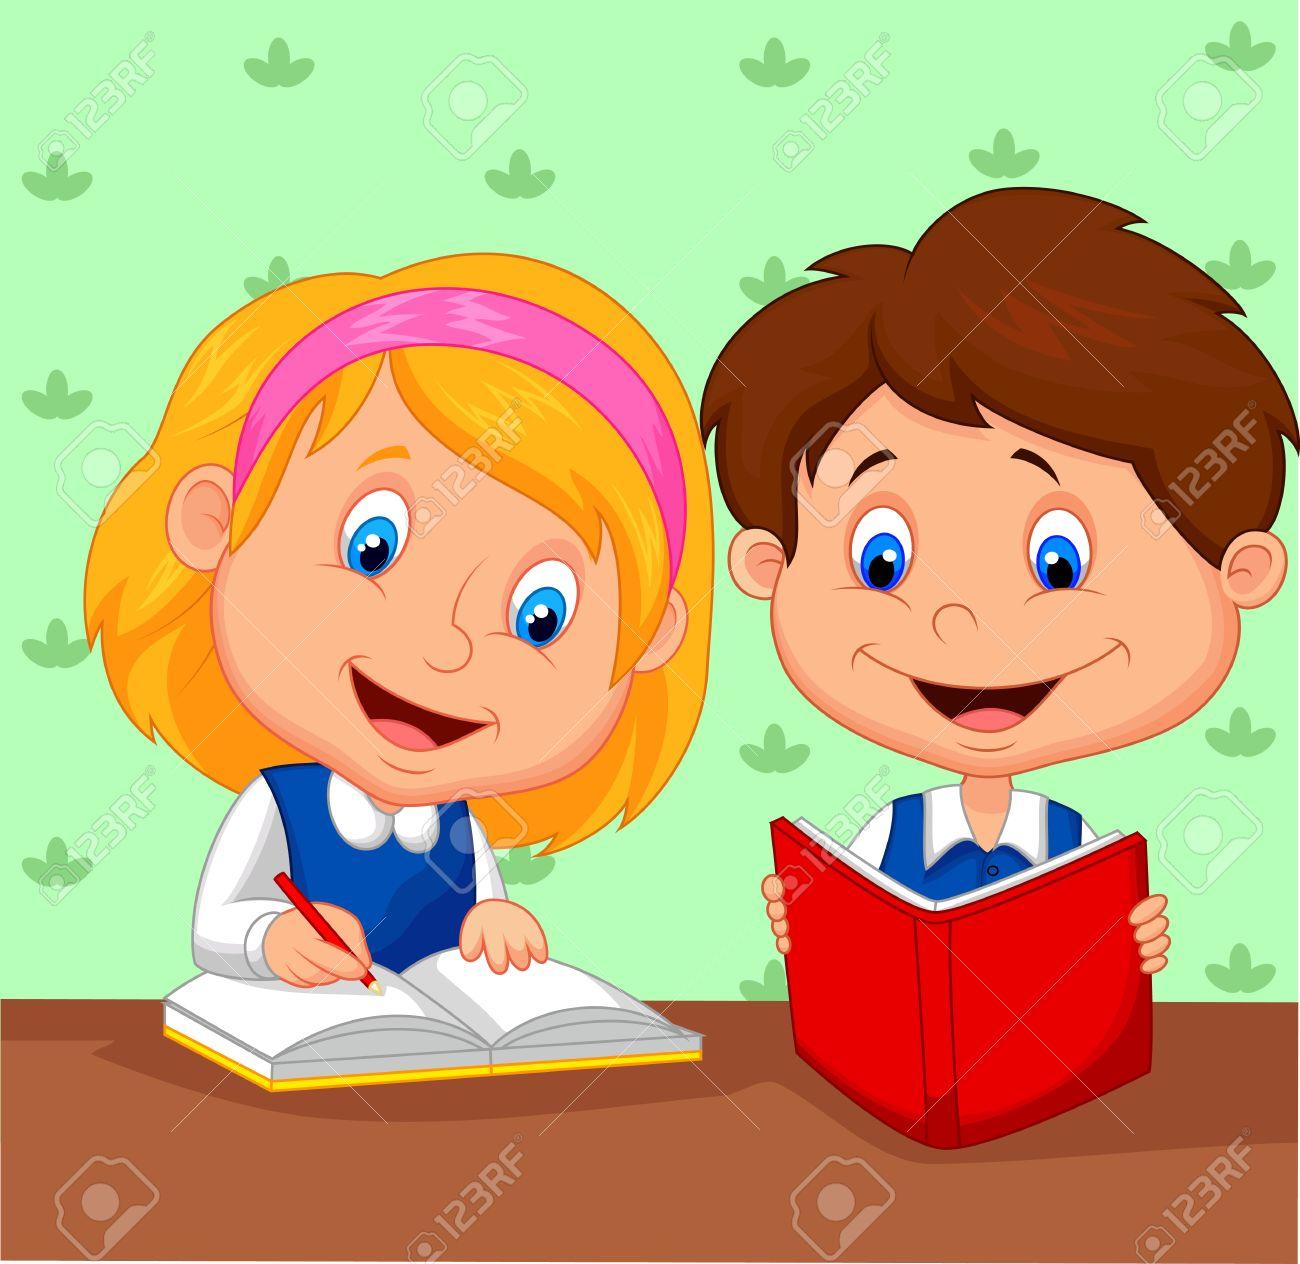 Cartoon Boy and girl study together.